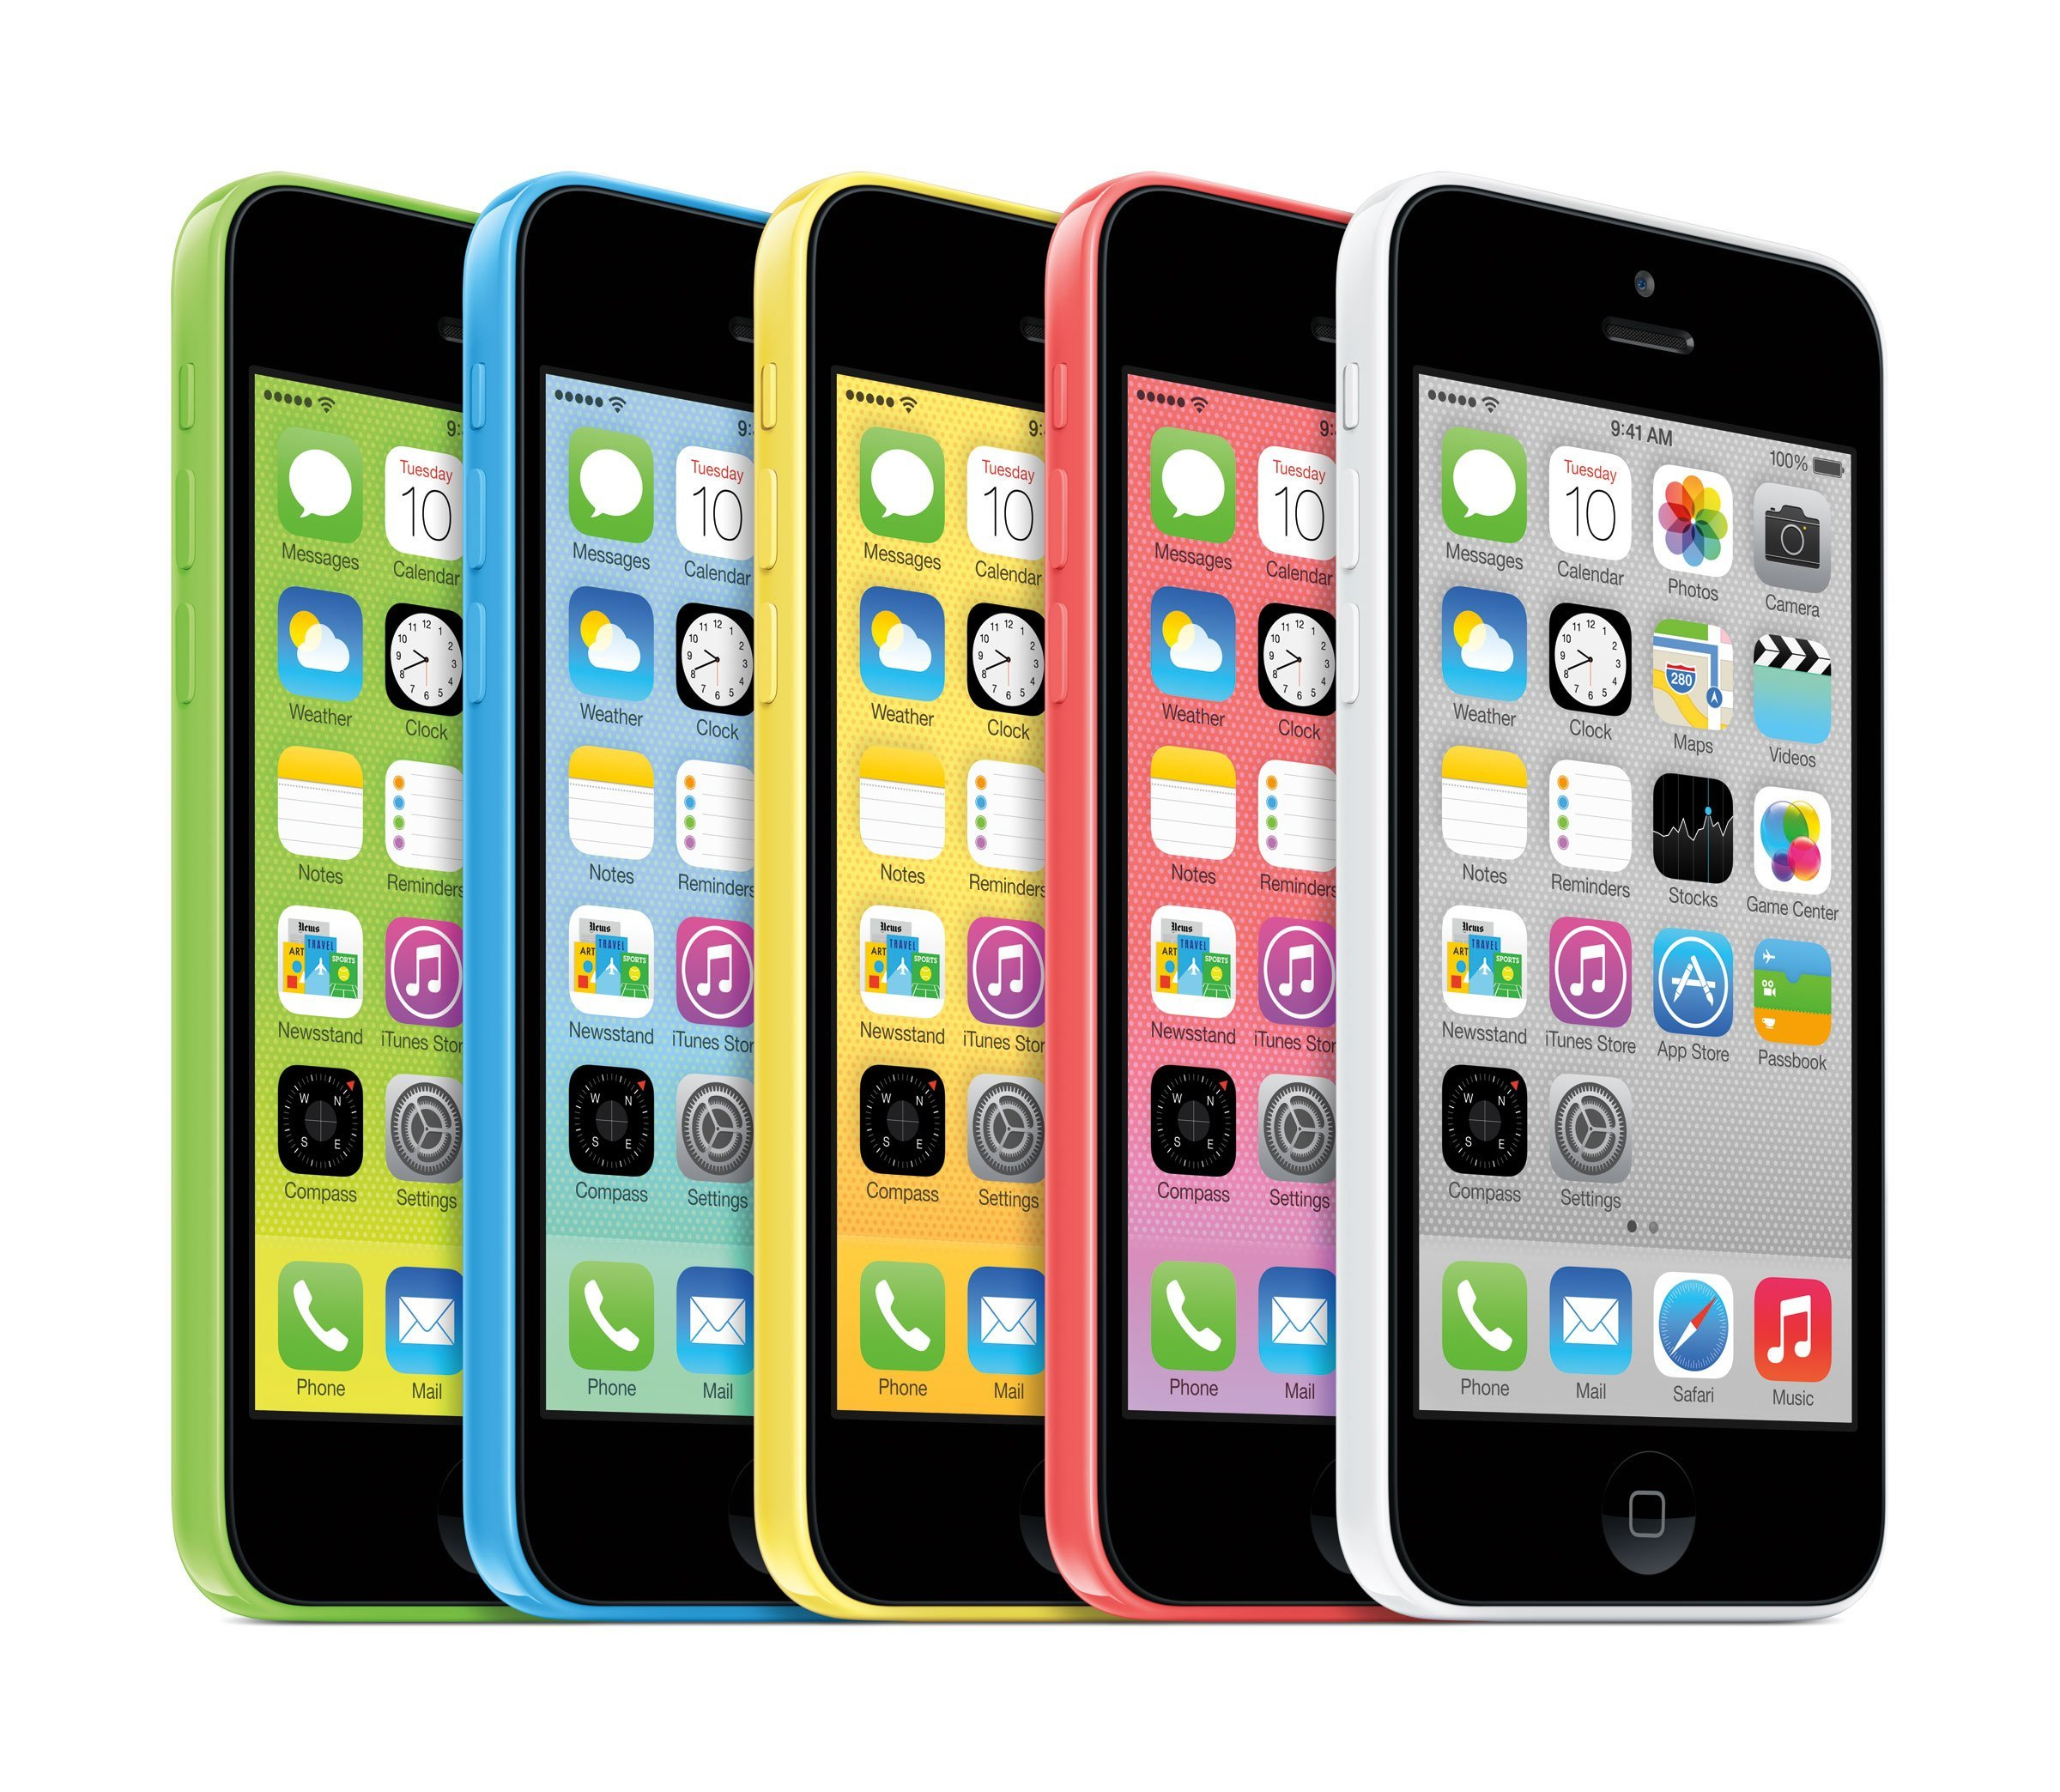 FBI braucht Hacker-Tools für San-Bernardino-iPhone nicht offenlegen